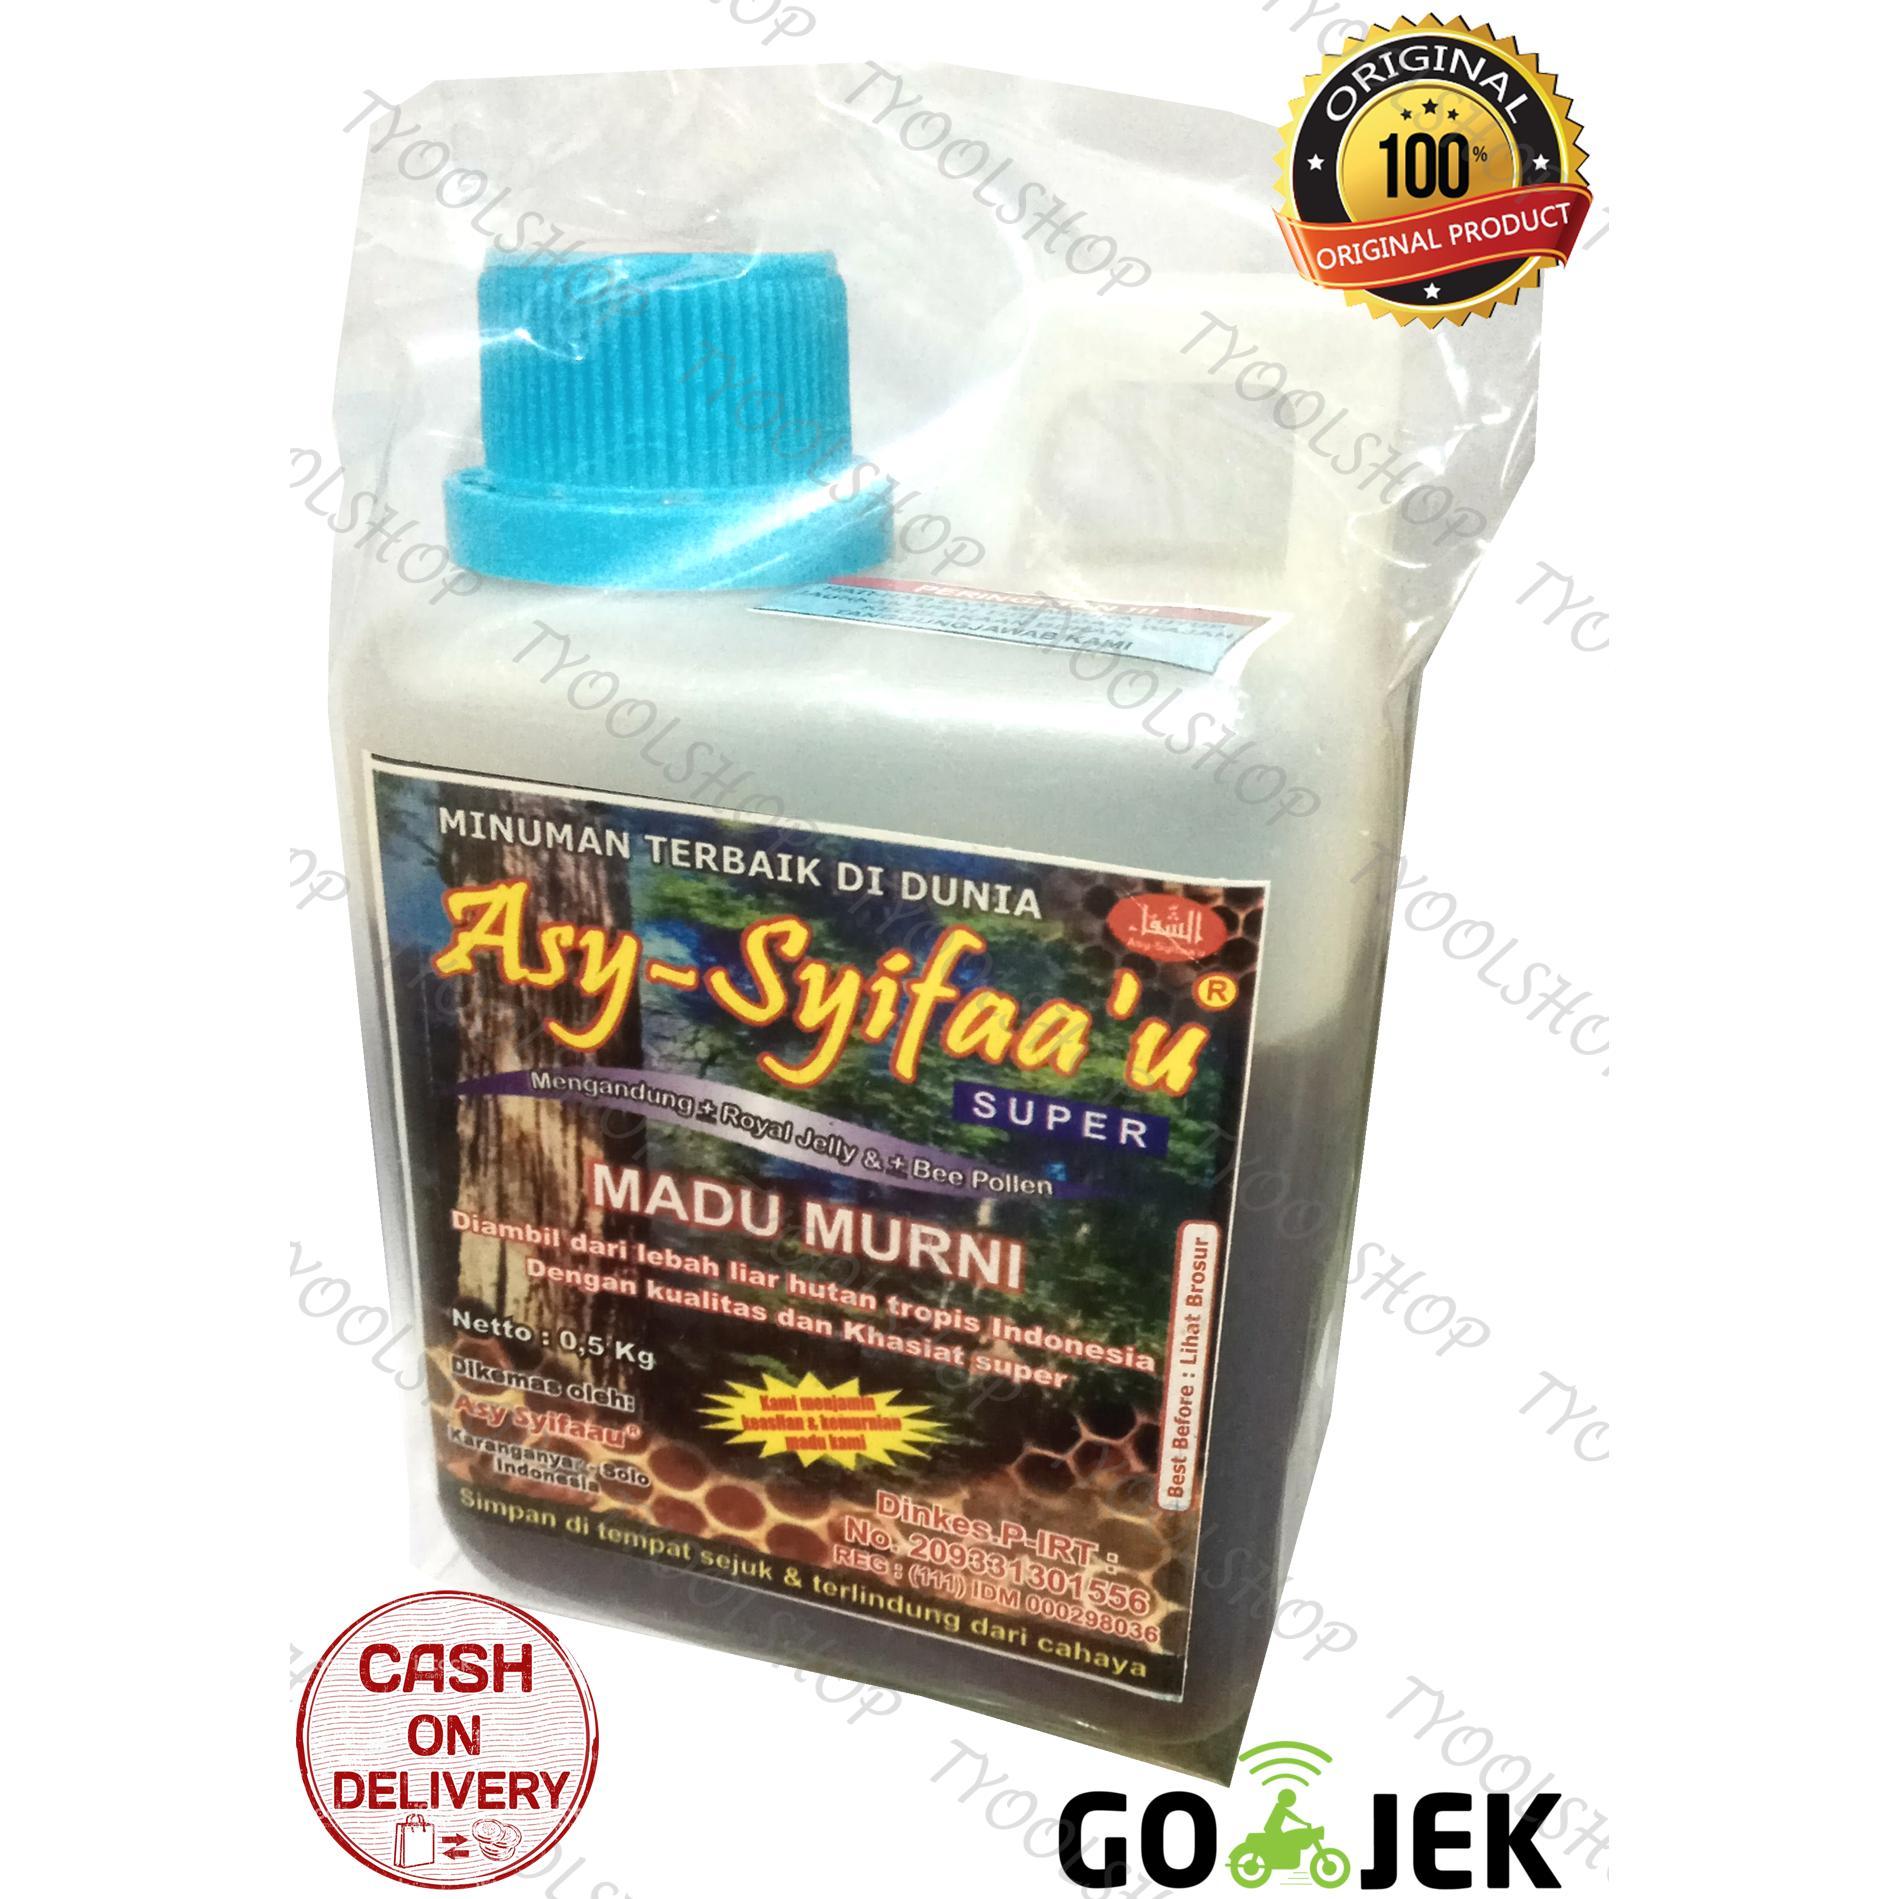 Asy-Syifaa'u Madu Murni Palembang - 500gr